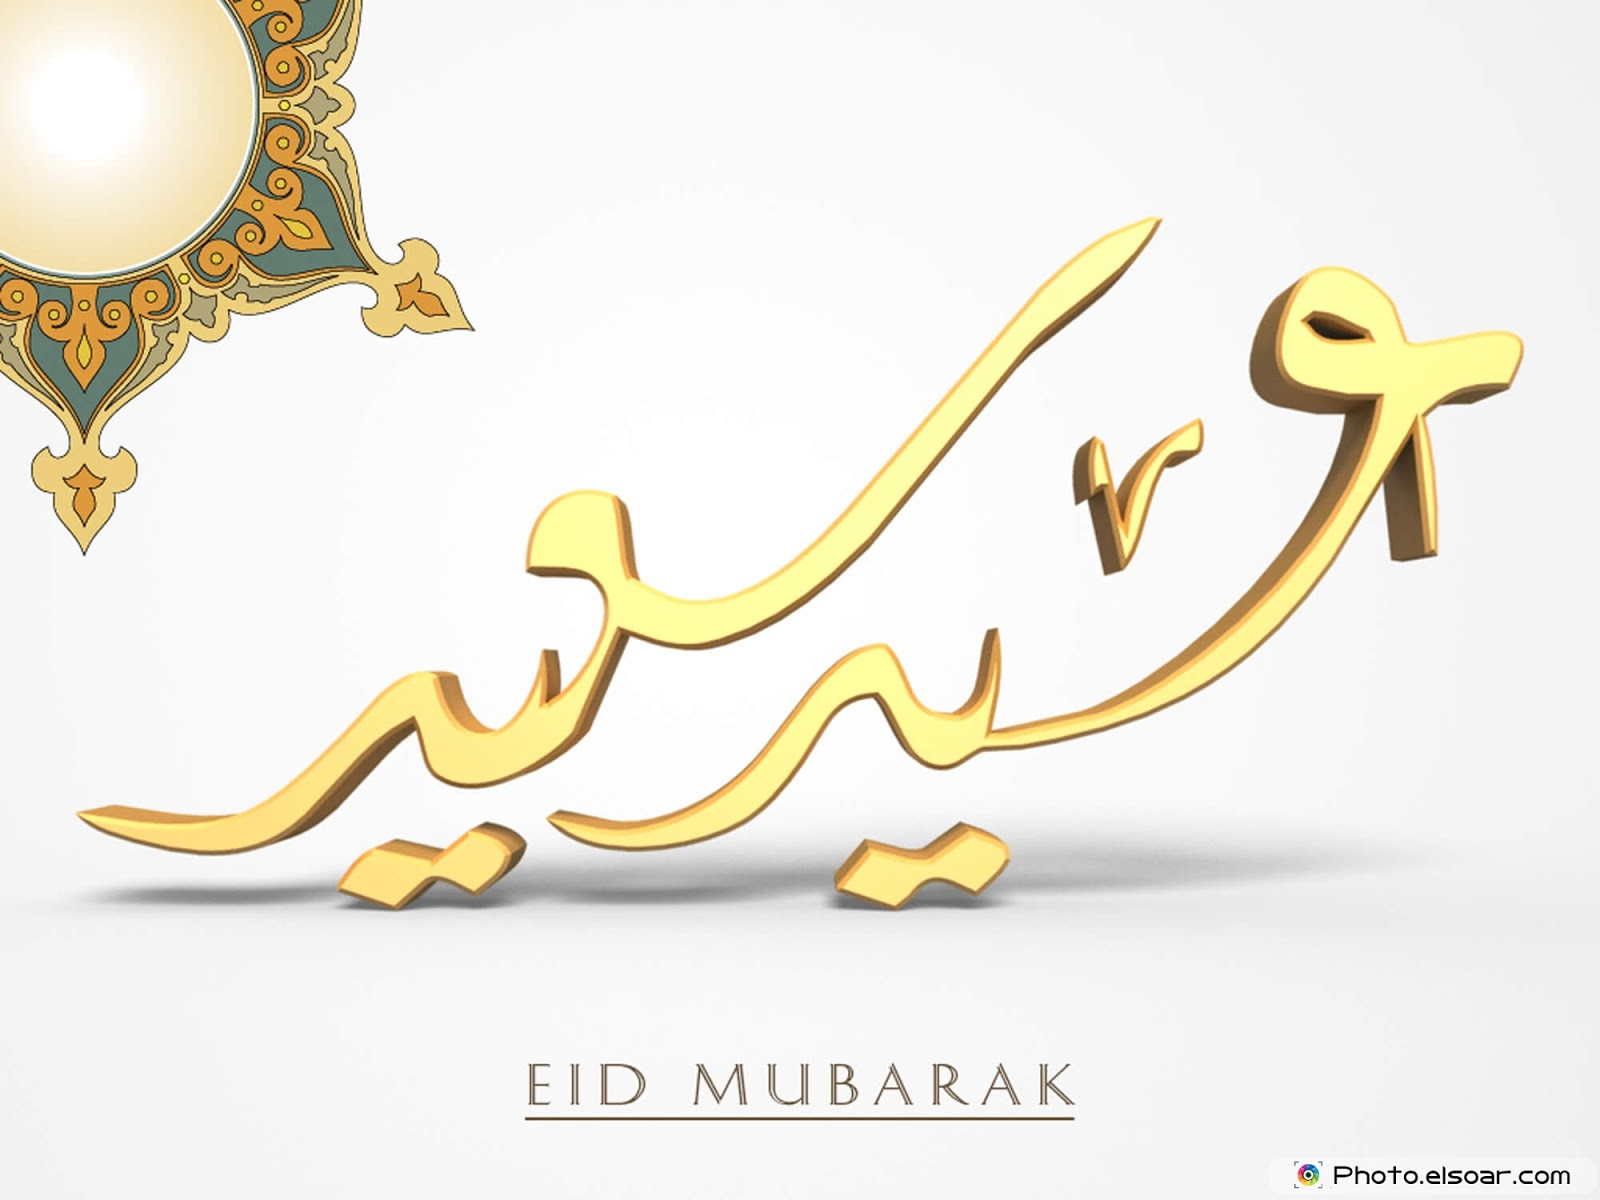 Advance eid mubarak eid ul adha 2017 imagesdppicphotos and eid eid mubarak golden text stylish images kristyandbryce Image collections